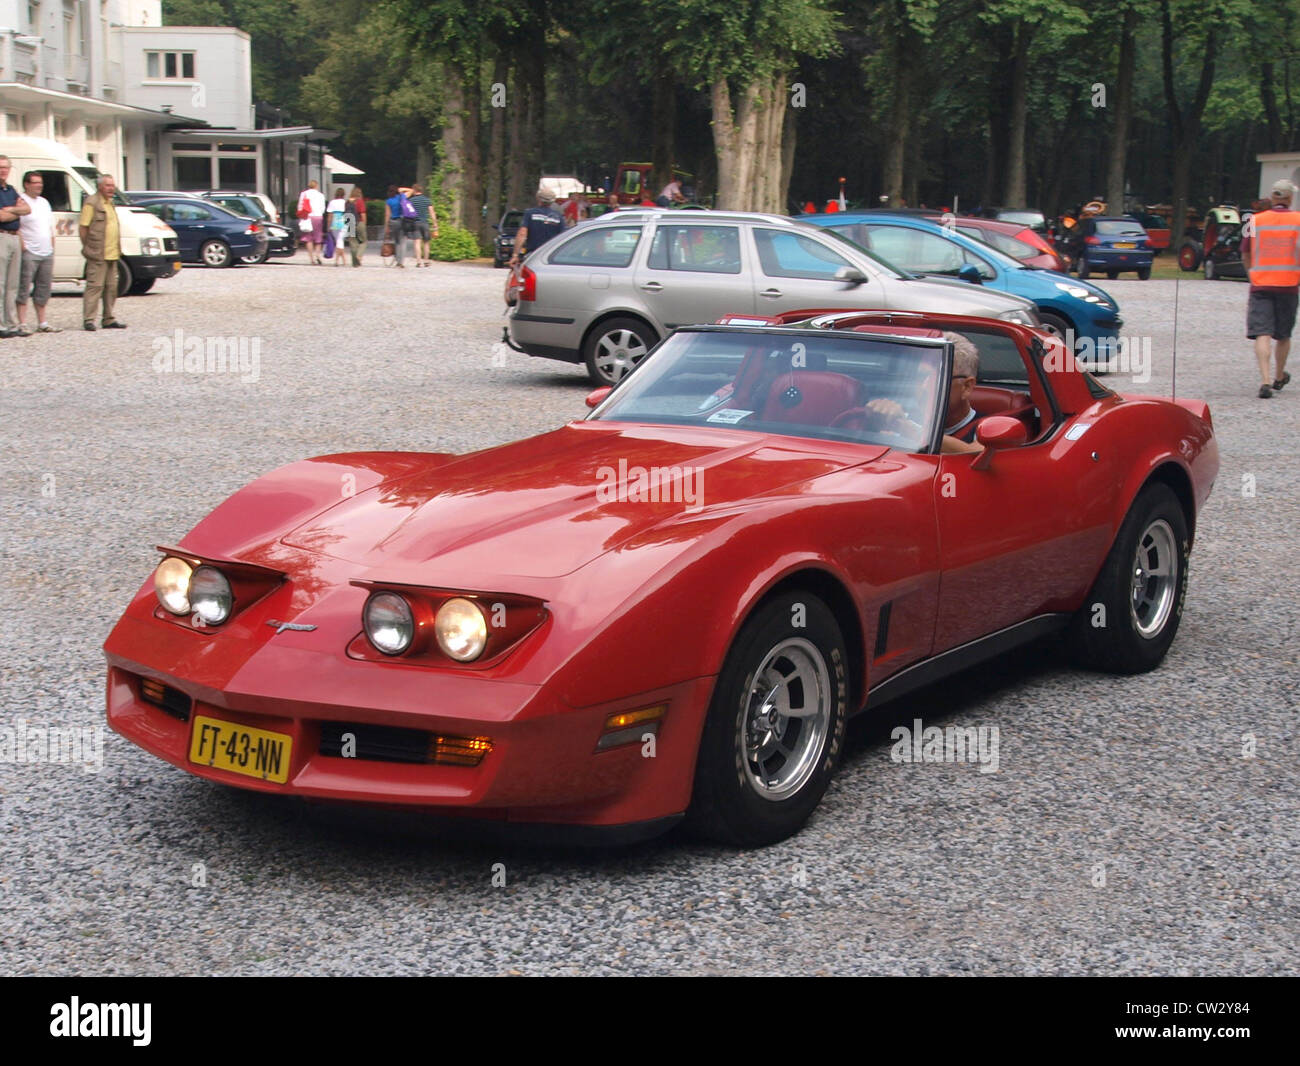 Kelebihan Chevrolet Corvette 1980 Top Model Tahun Ini